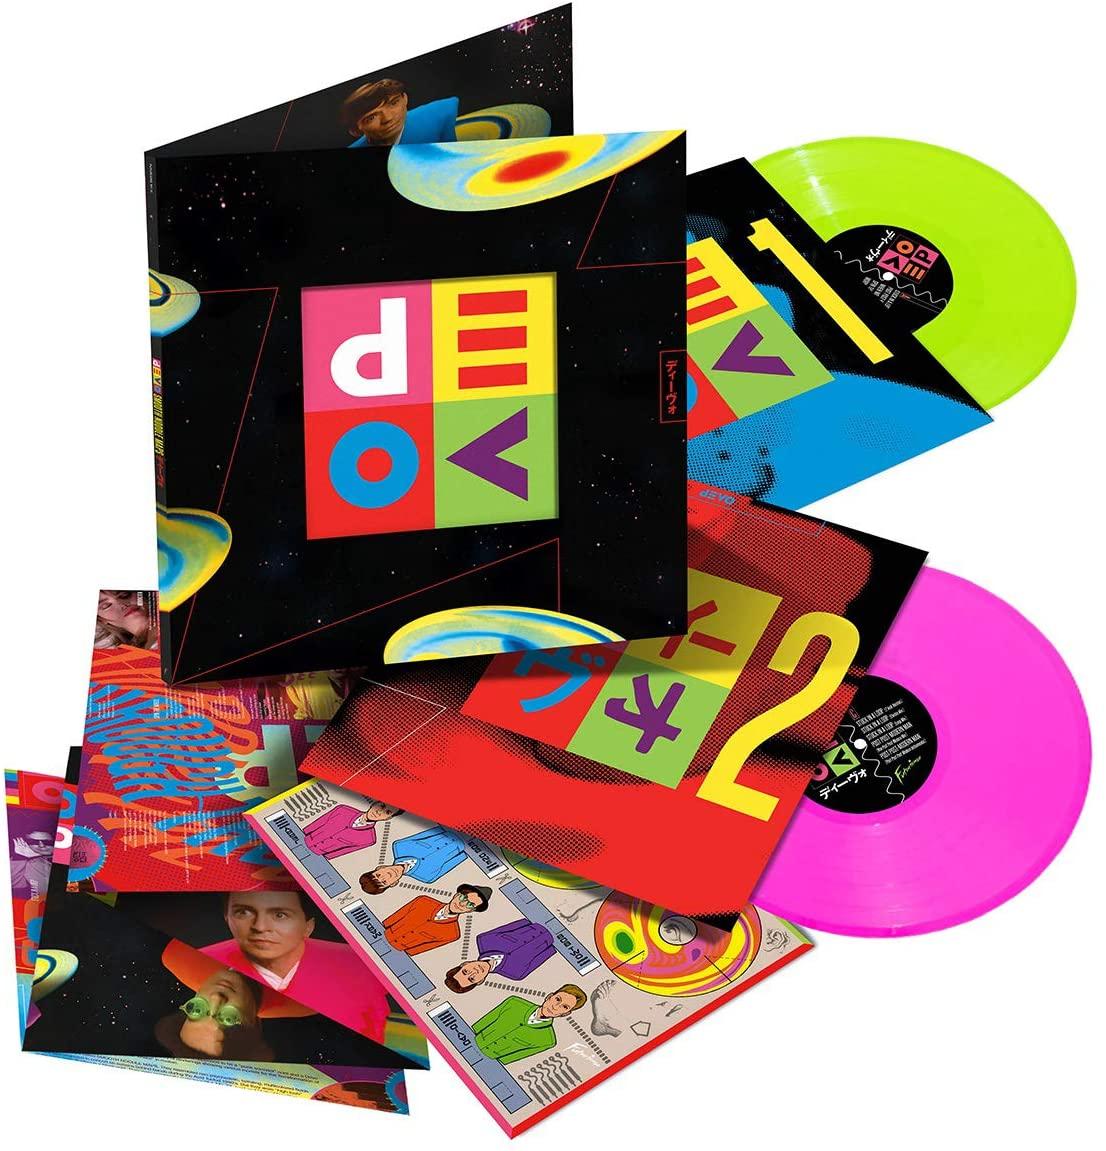 Devo - Smooth Noodle Maps Deluxe Edition 2 x LP Neon Pink & Green Coloured 180g Vinyl Prime - £12.50 Prime / £15.49 non-Prime @ Amazon